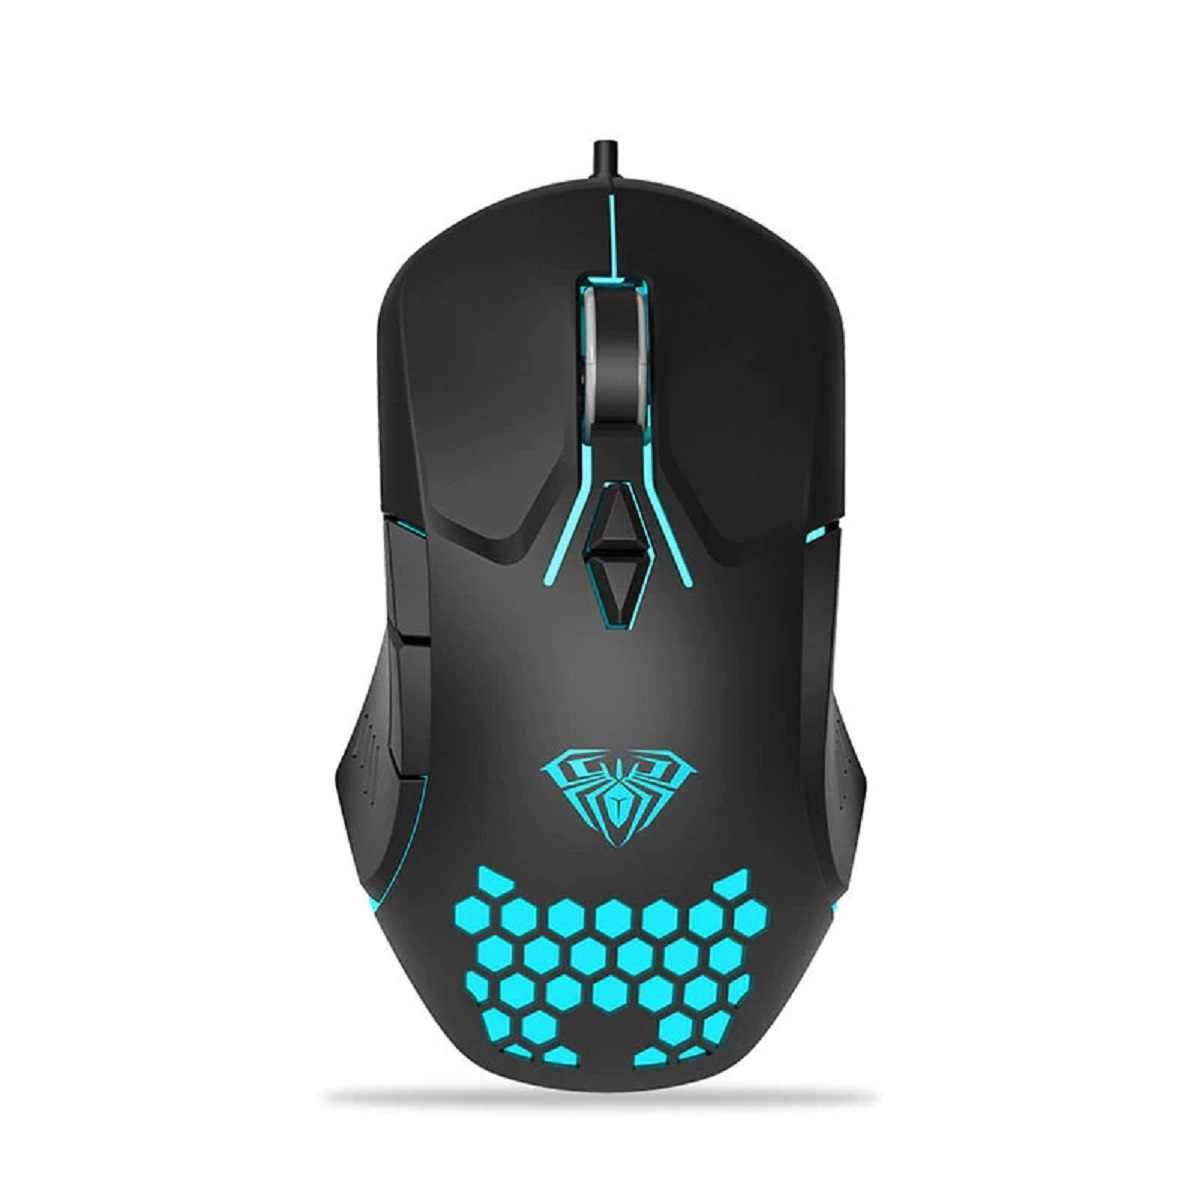 Mouse Profissional Gamer Usb 3200dpi 7 Botões Rgb F809 Aula